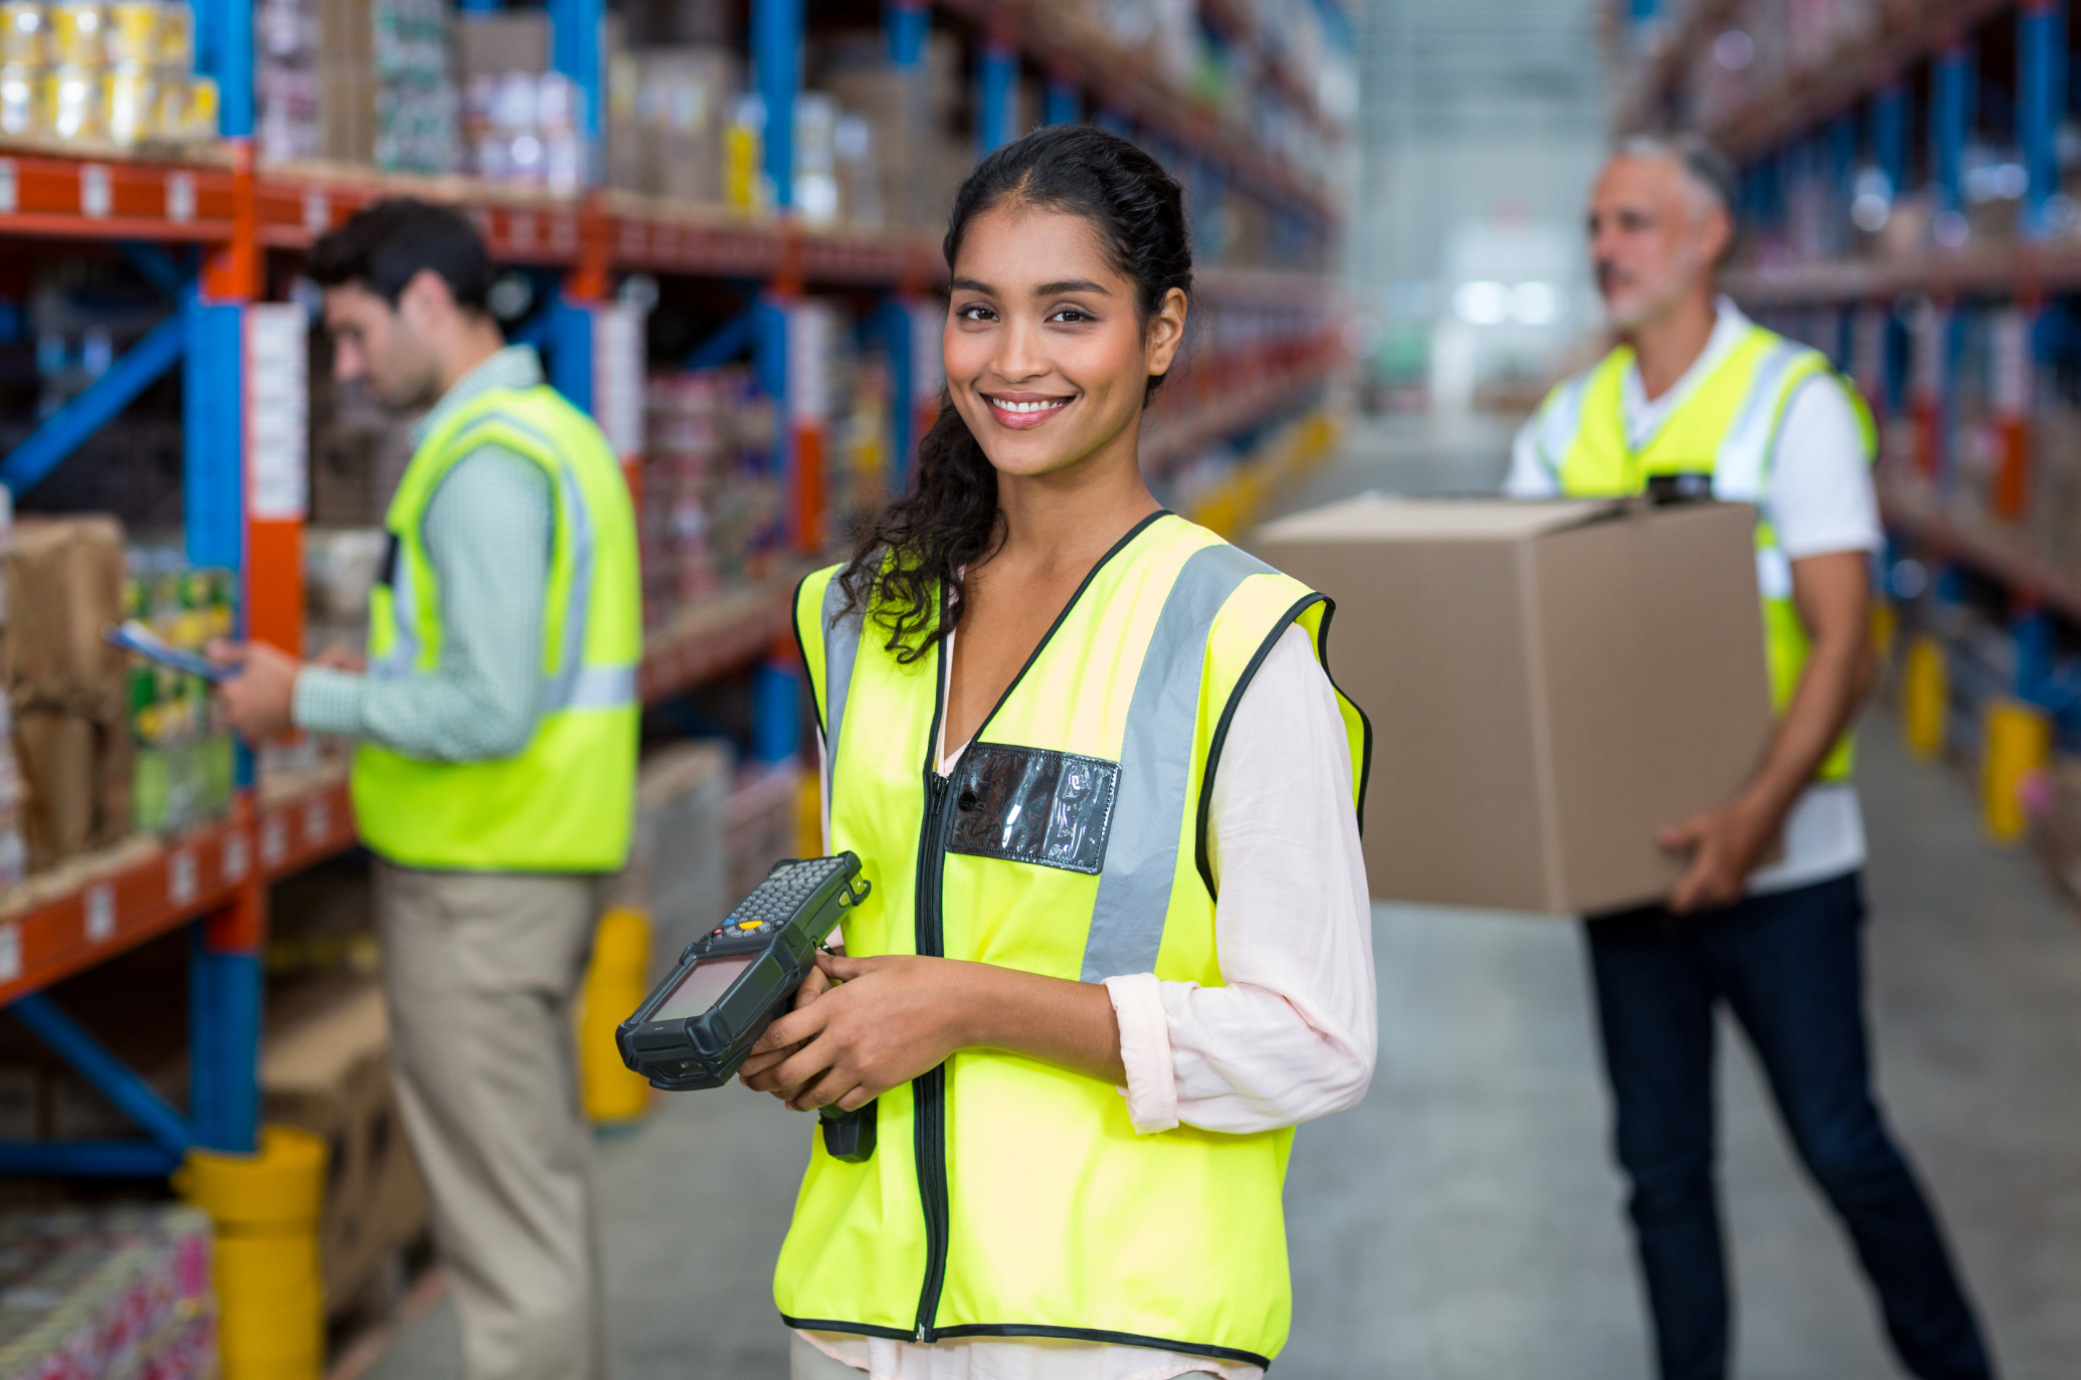 Inventory & Asset Management System